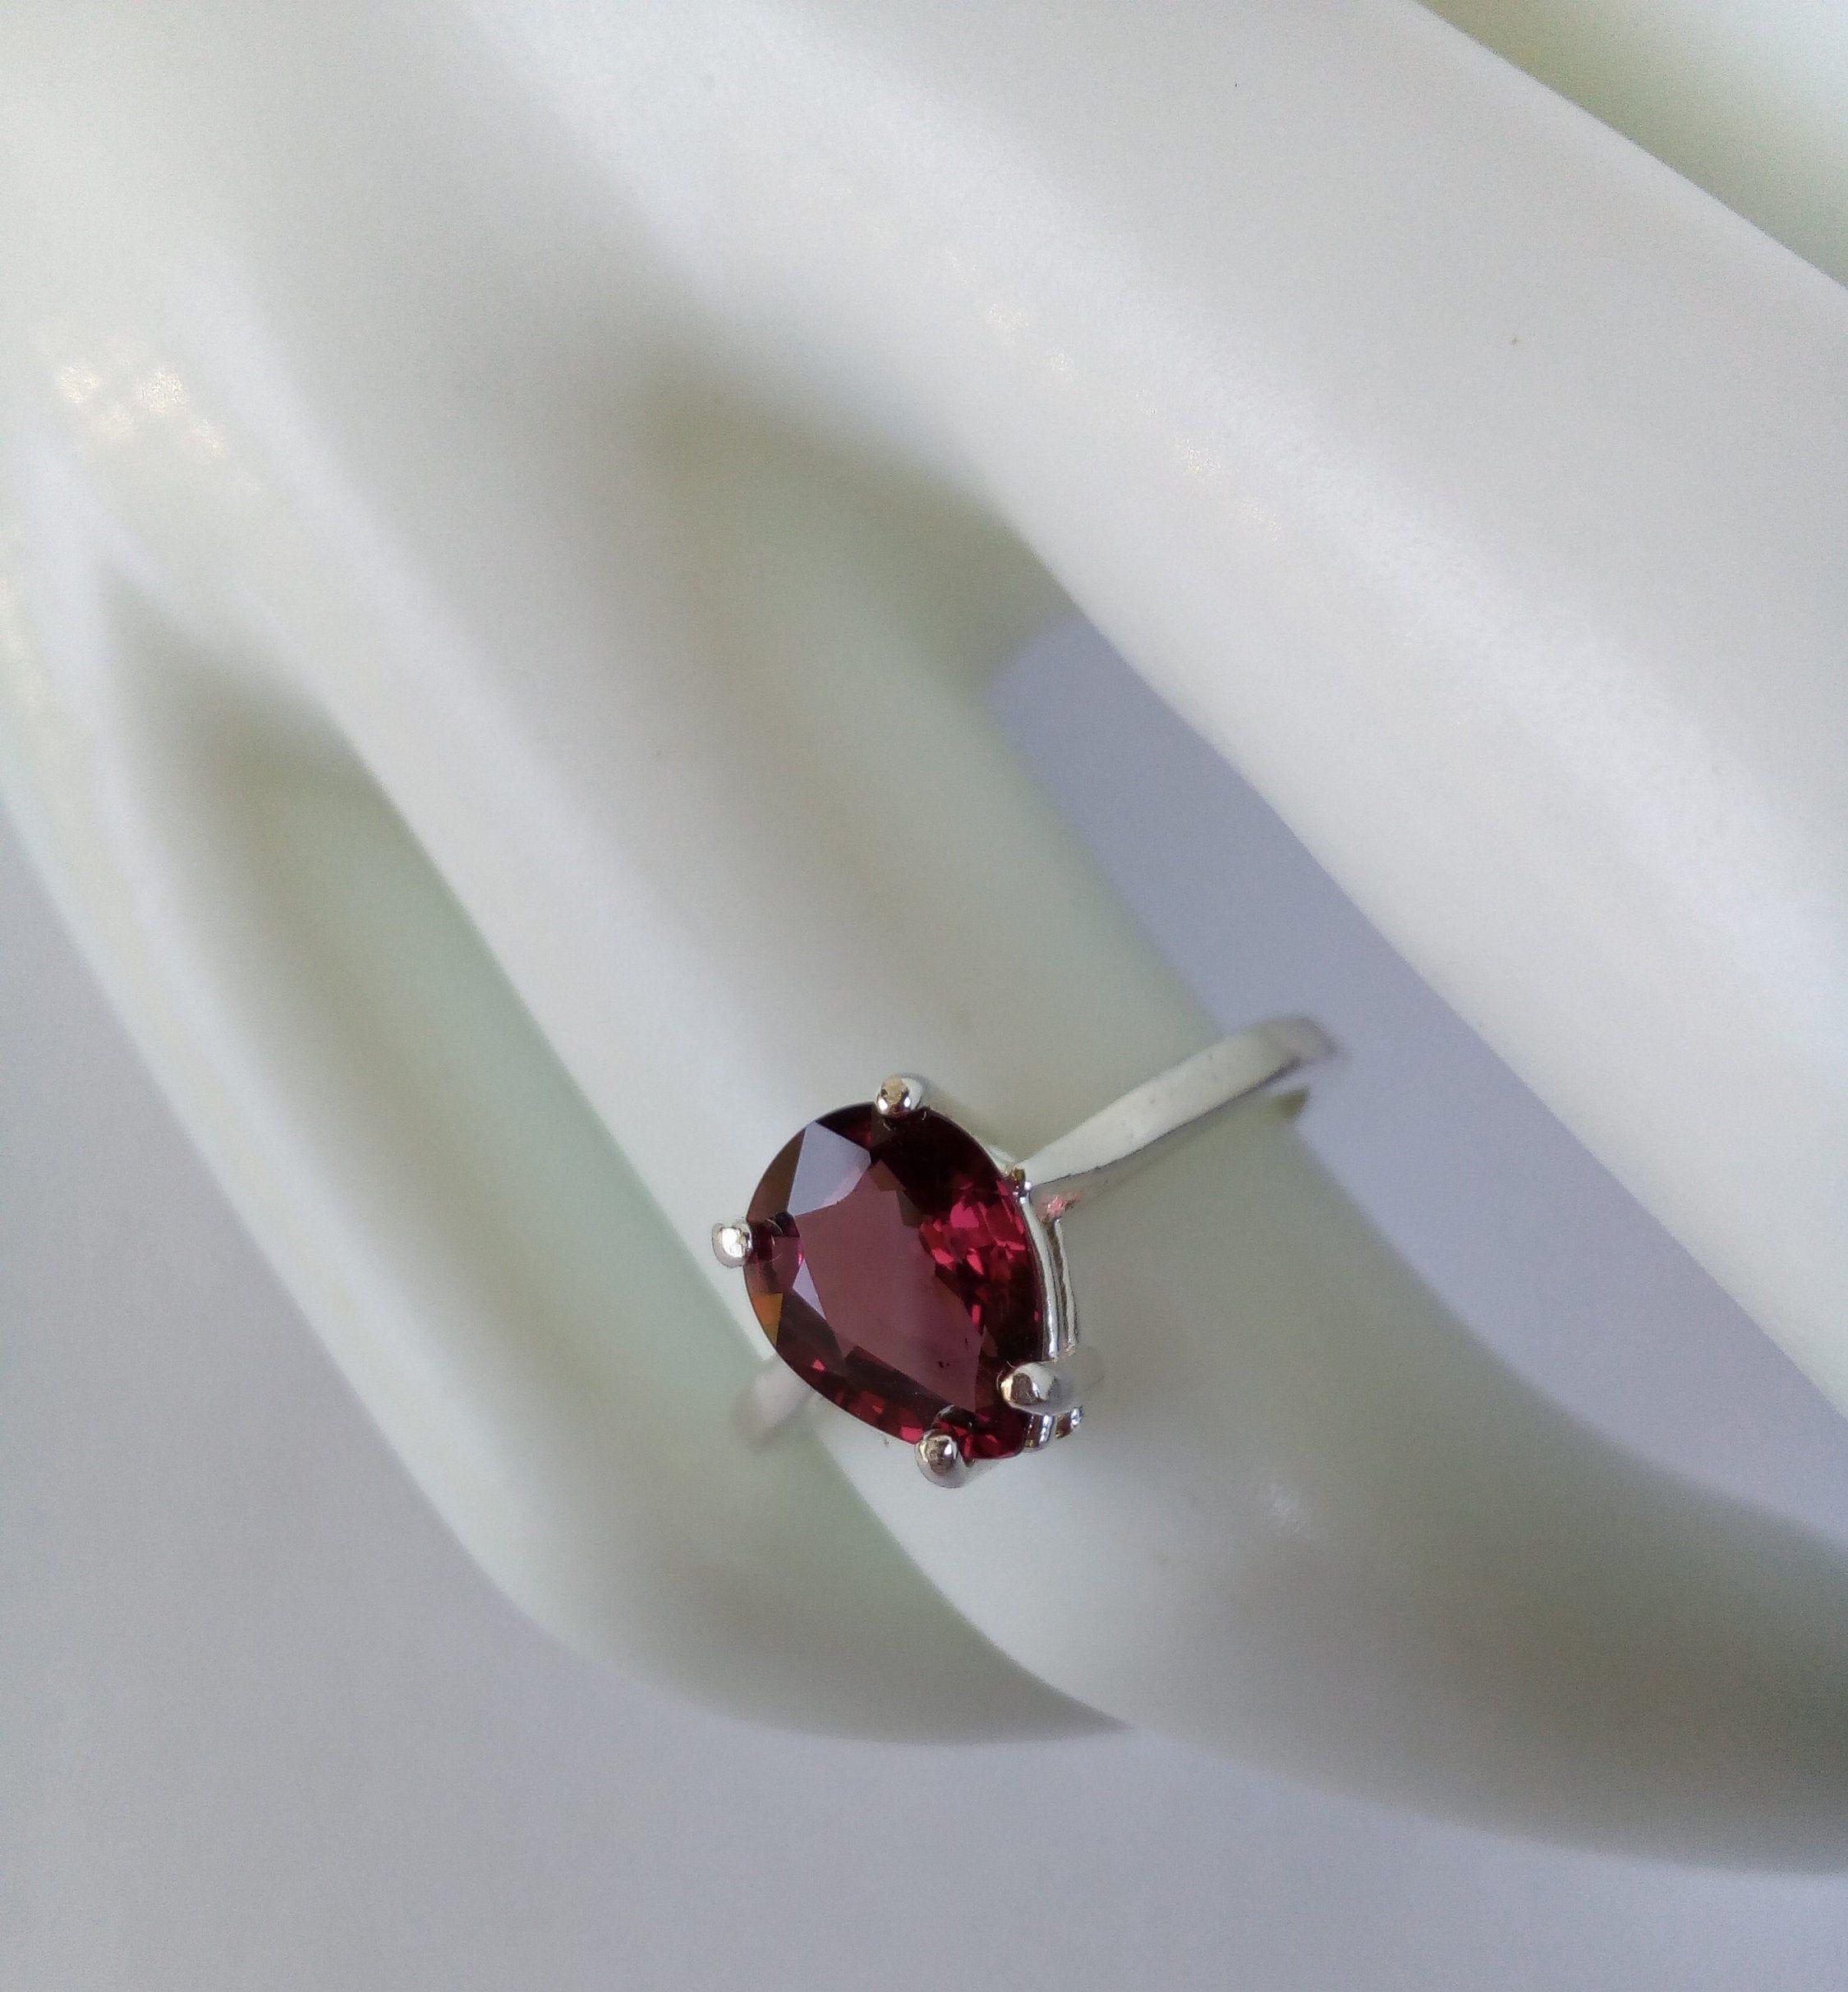 Sale Natural Gemstone Faceted Gemstone Handmade Garnet Quartz Ring Red Color Stone 925 Sterling Silver Oval Shape Prong Setting